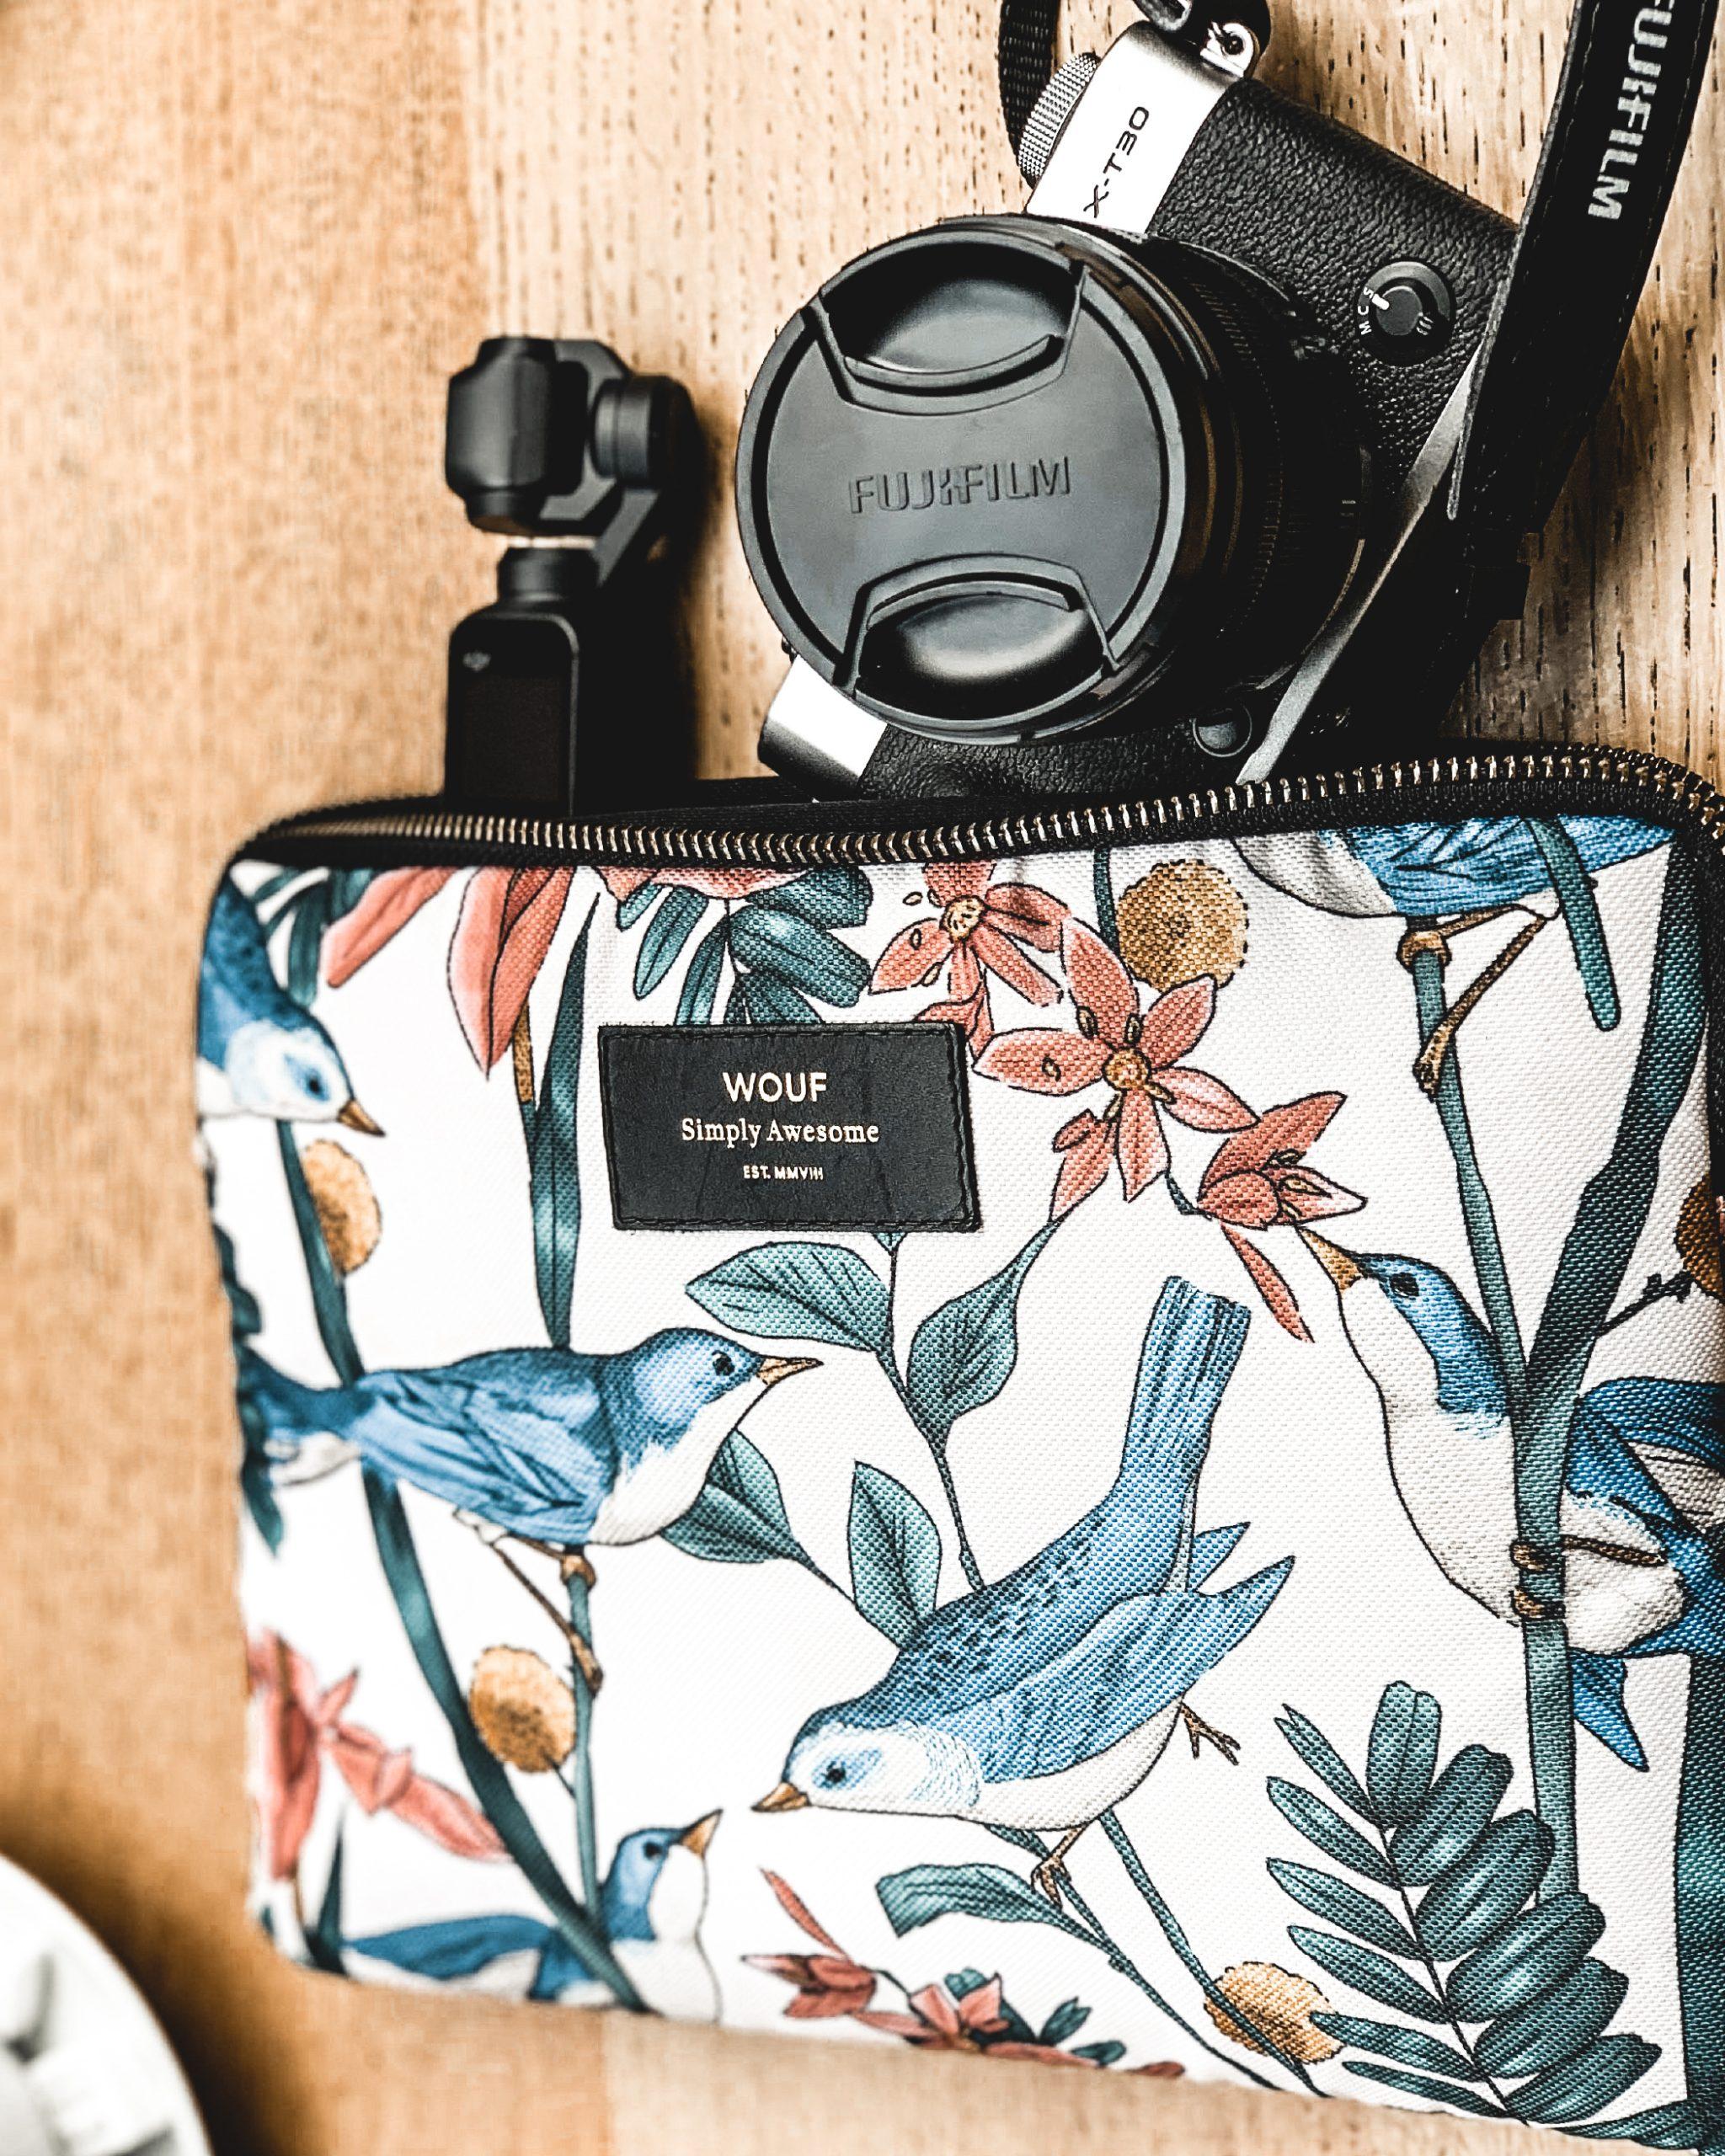 Travel girl in Paris, using Fujifilm TX 30 & DJI Osmo pocket camera to make video and wonderful photography. Setting at a Parisian Cafe